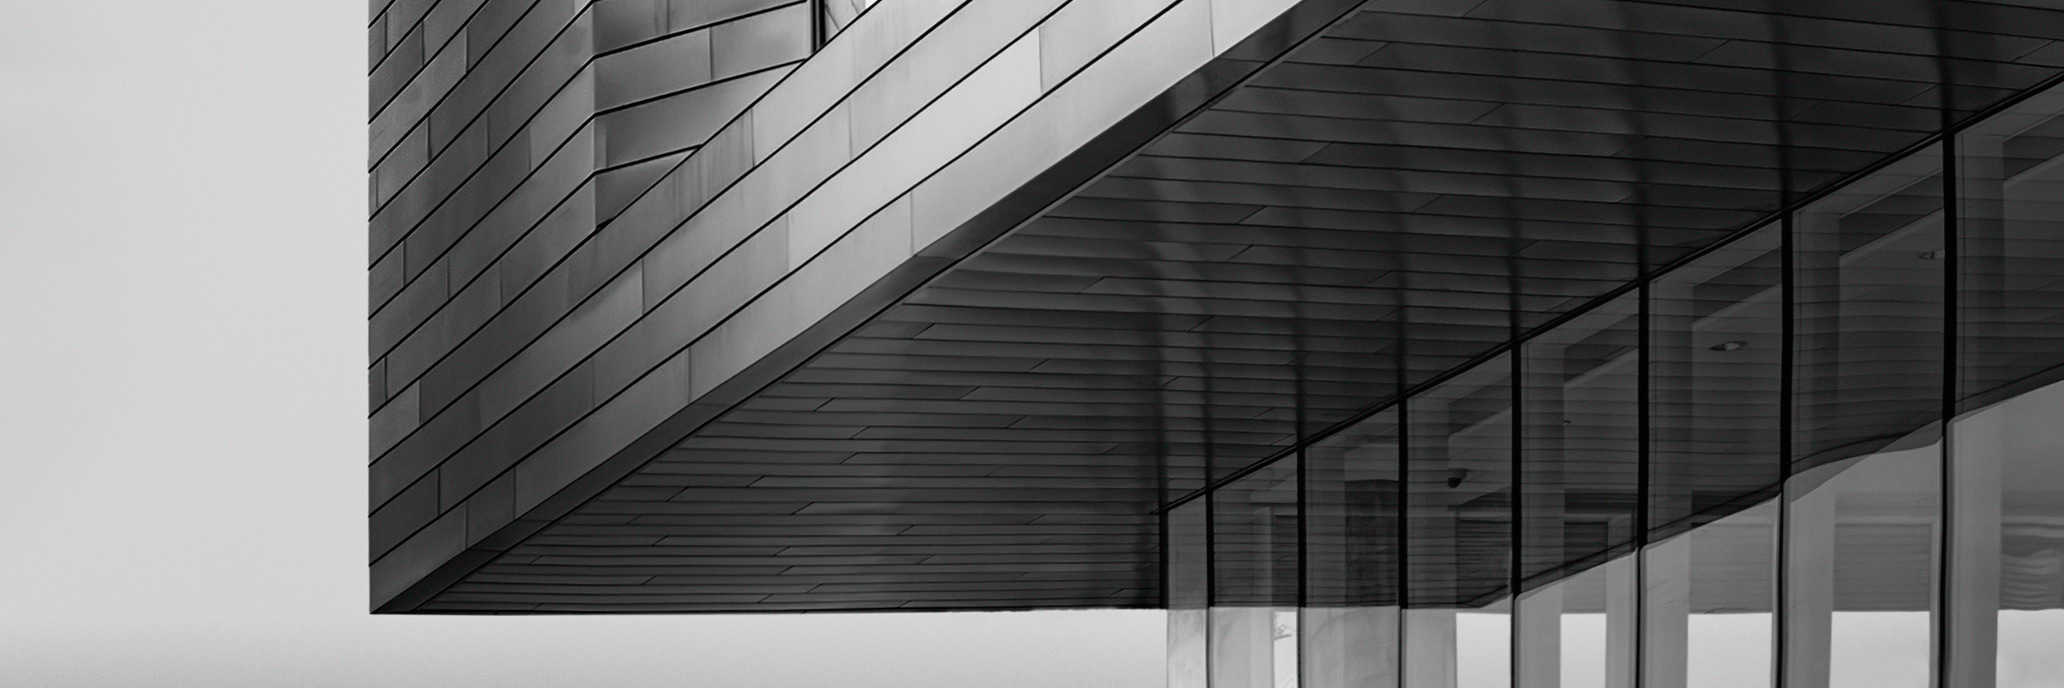 The New Addition: Milwaukee Art Museum